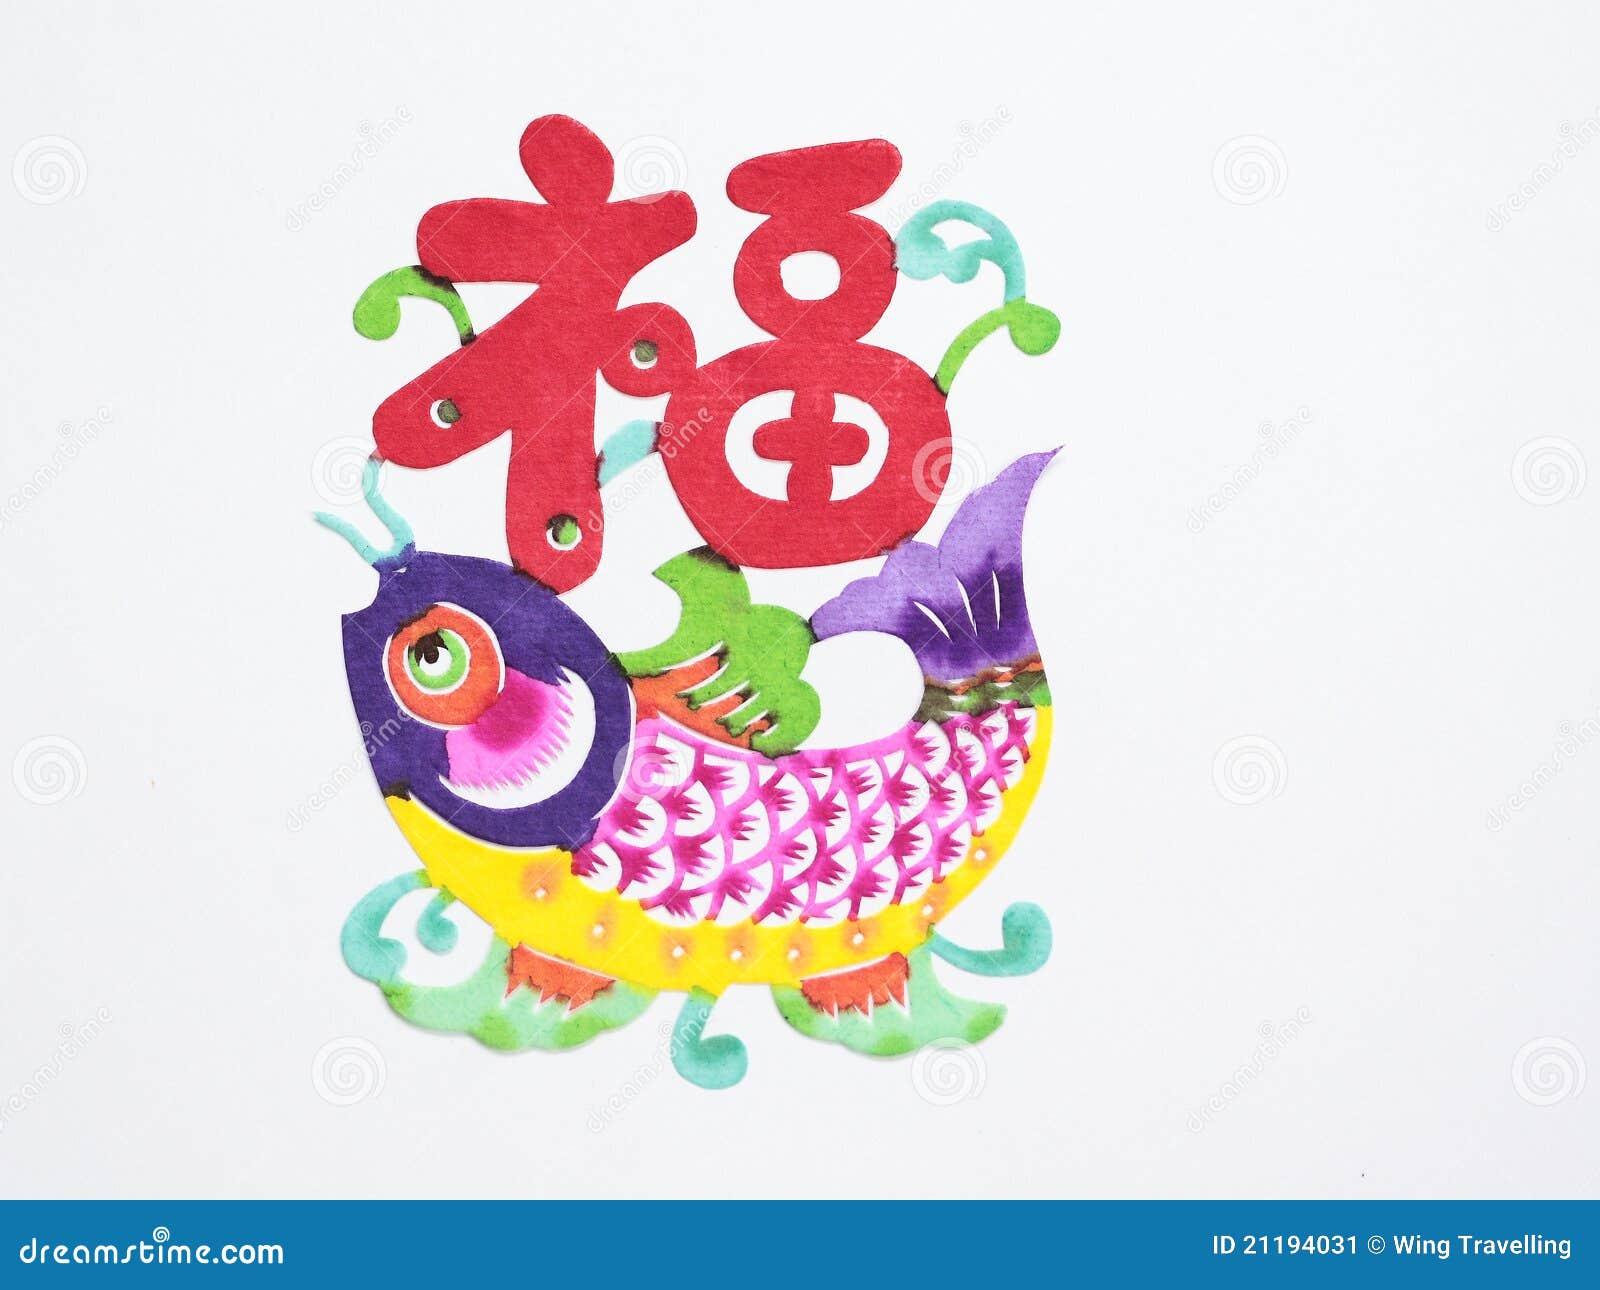 Paper-cut of fish